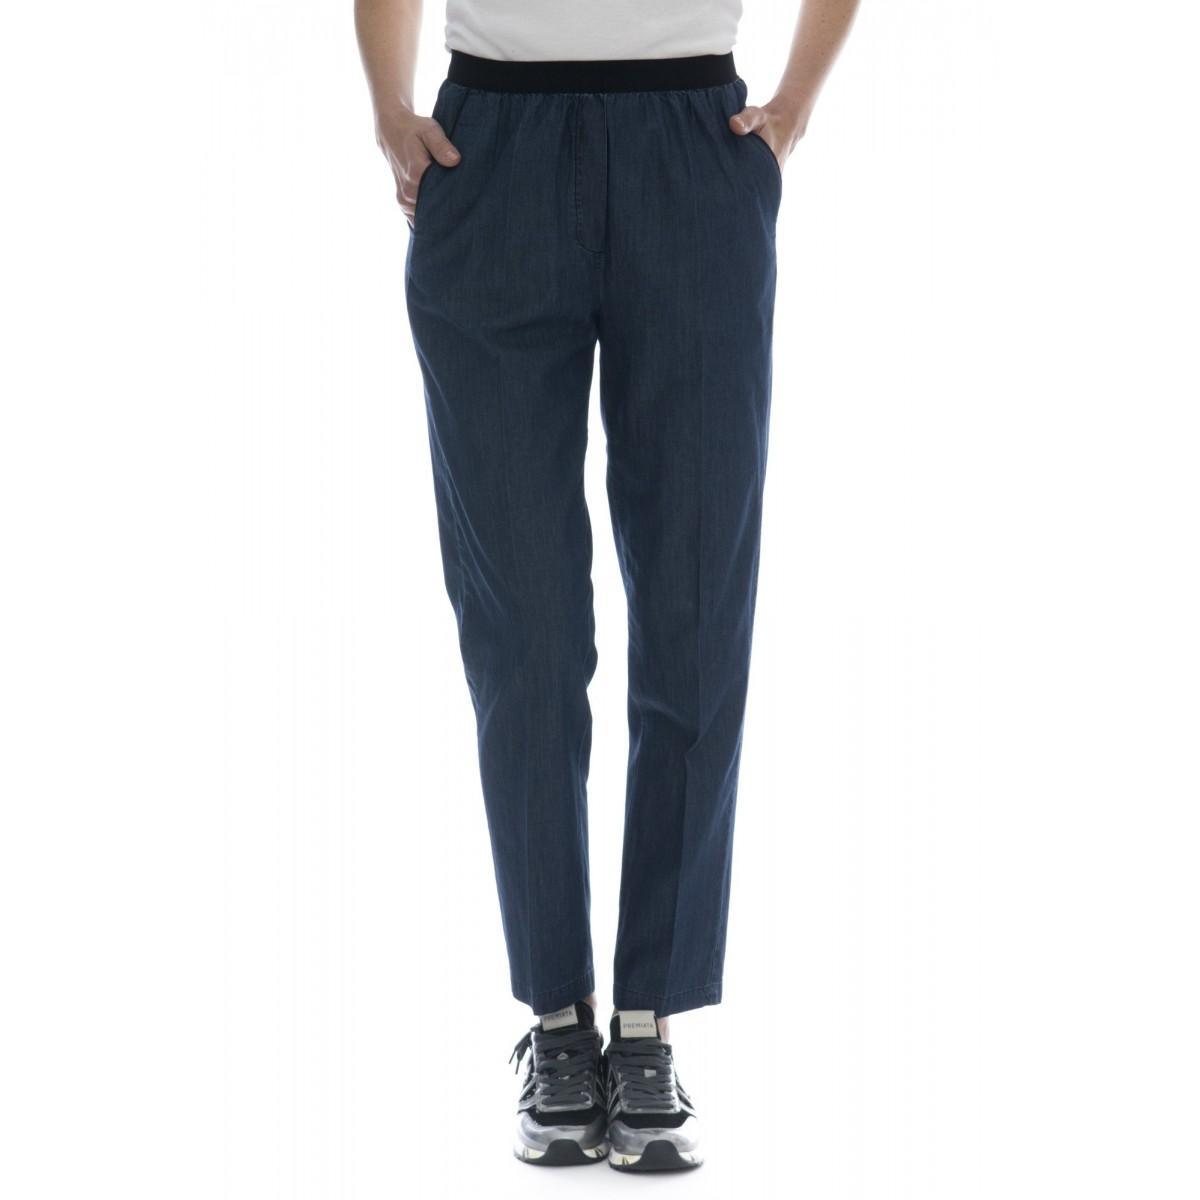 Pantalone donna - 4044 pantalone denim con elastico